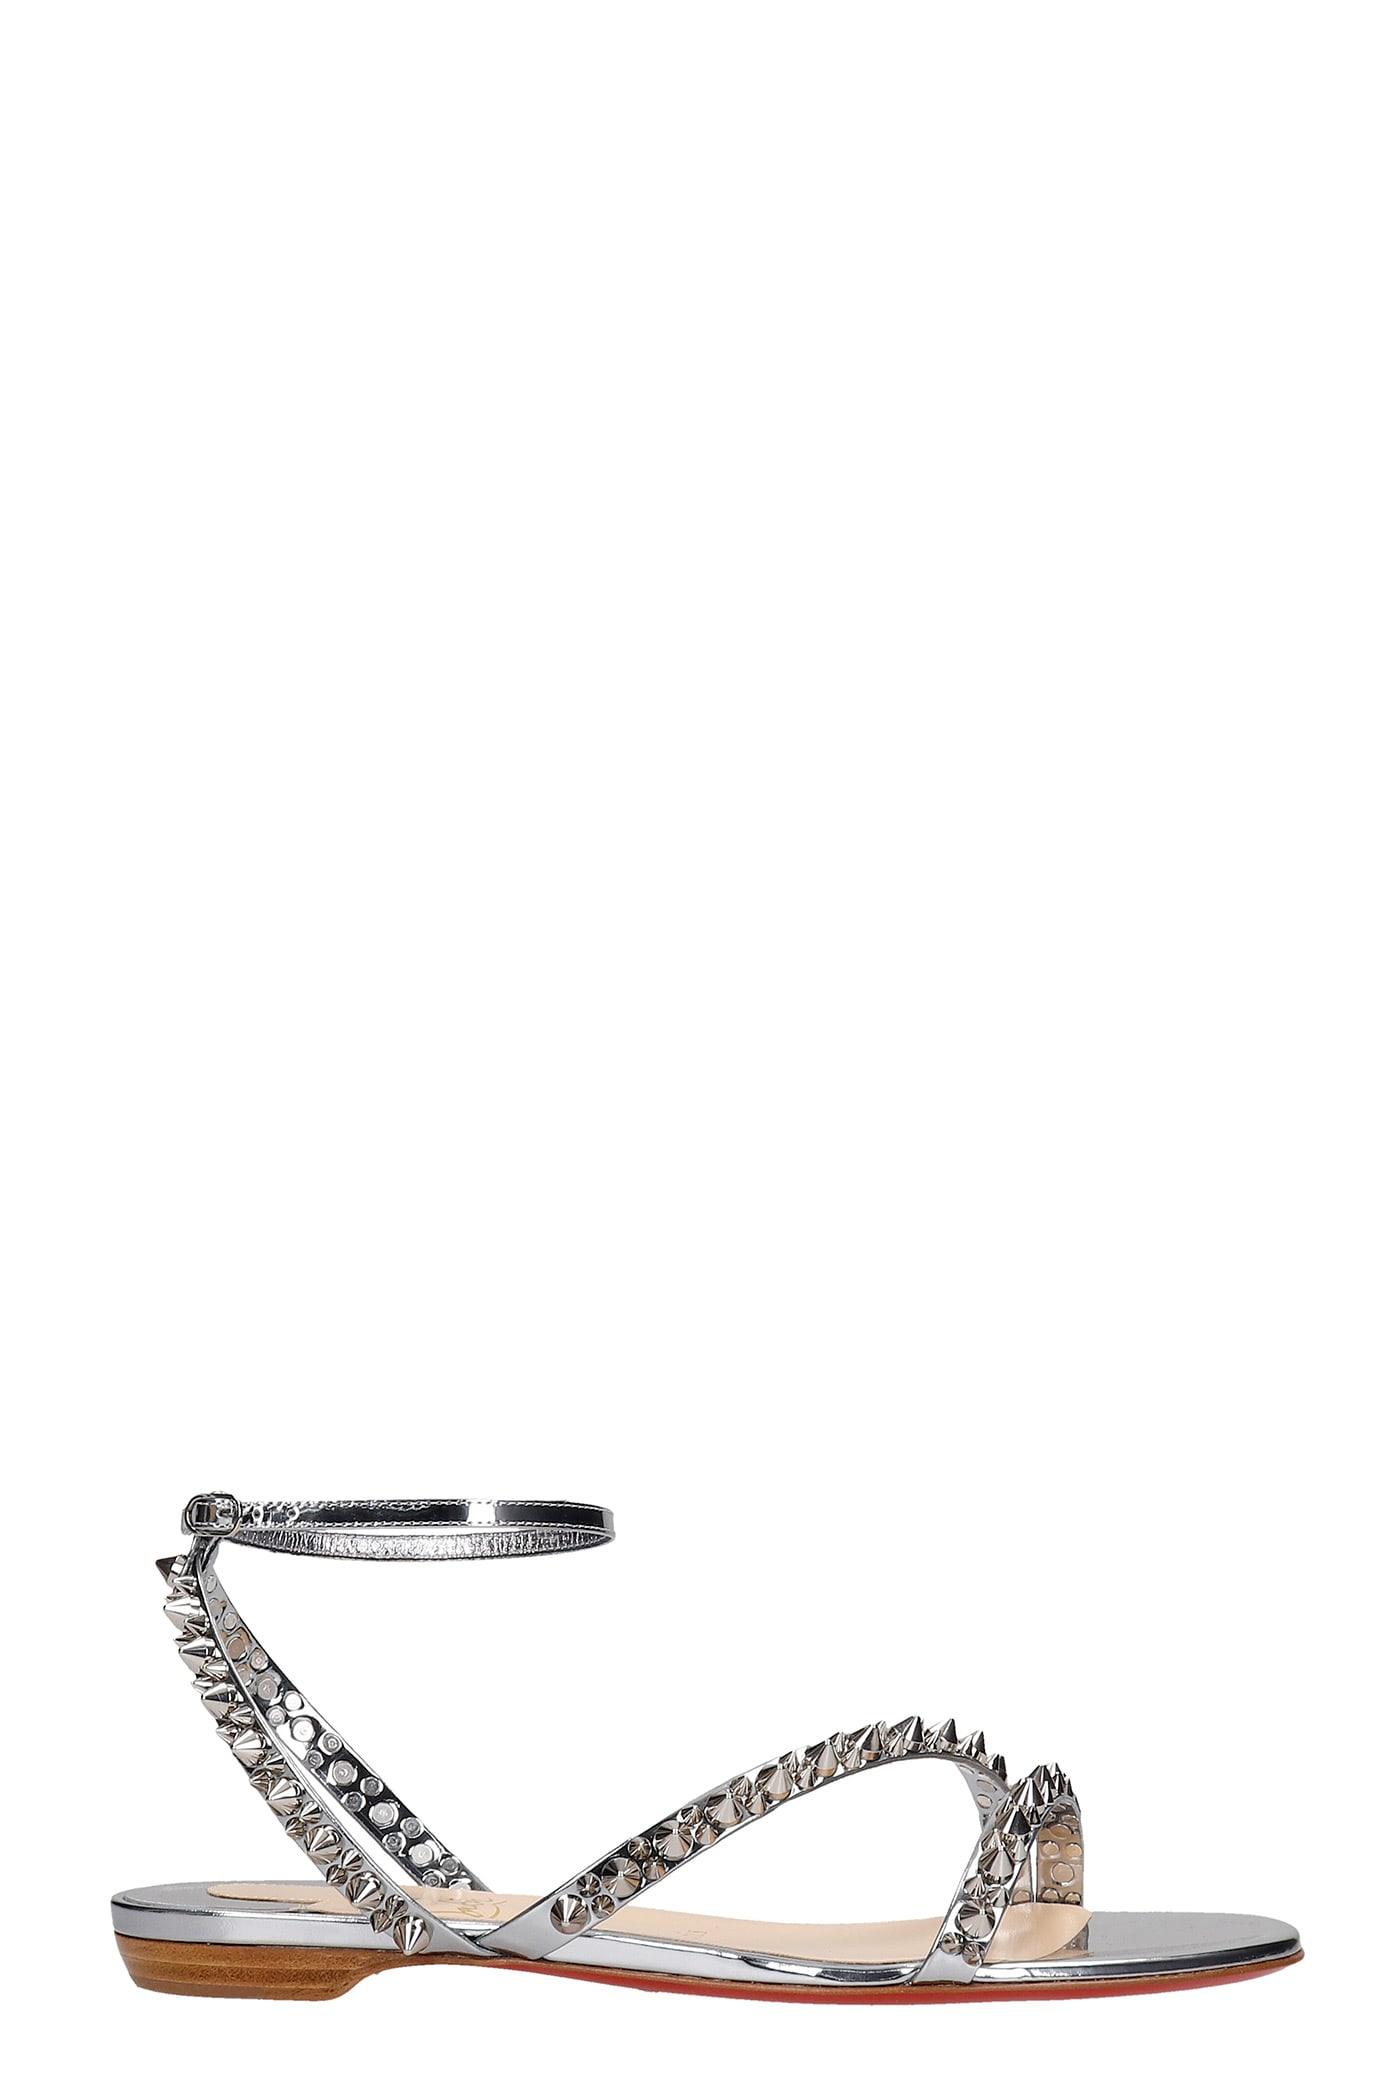 Buy Christian Louboutin Mafaldina Flats In Silver Leather online, shop Christian Louboutin shoes with free shipping